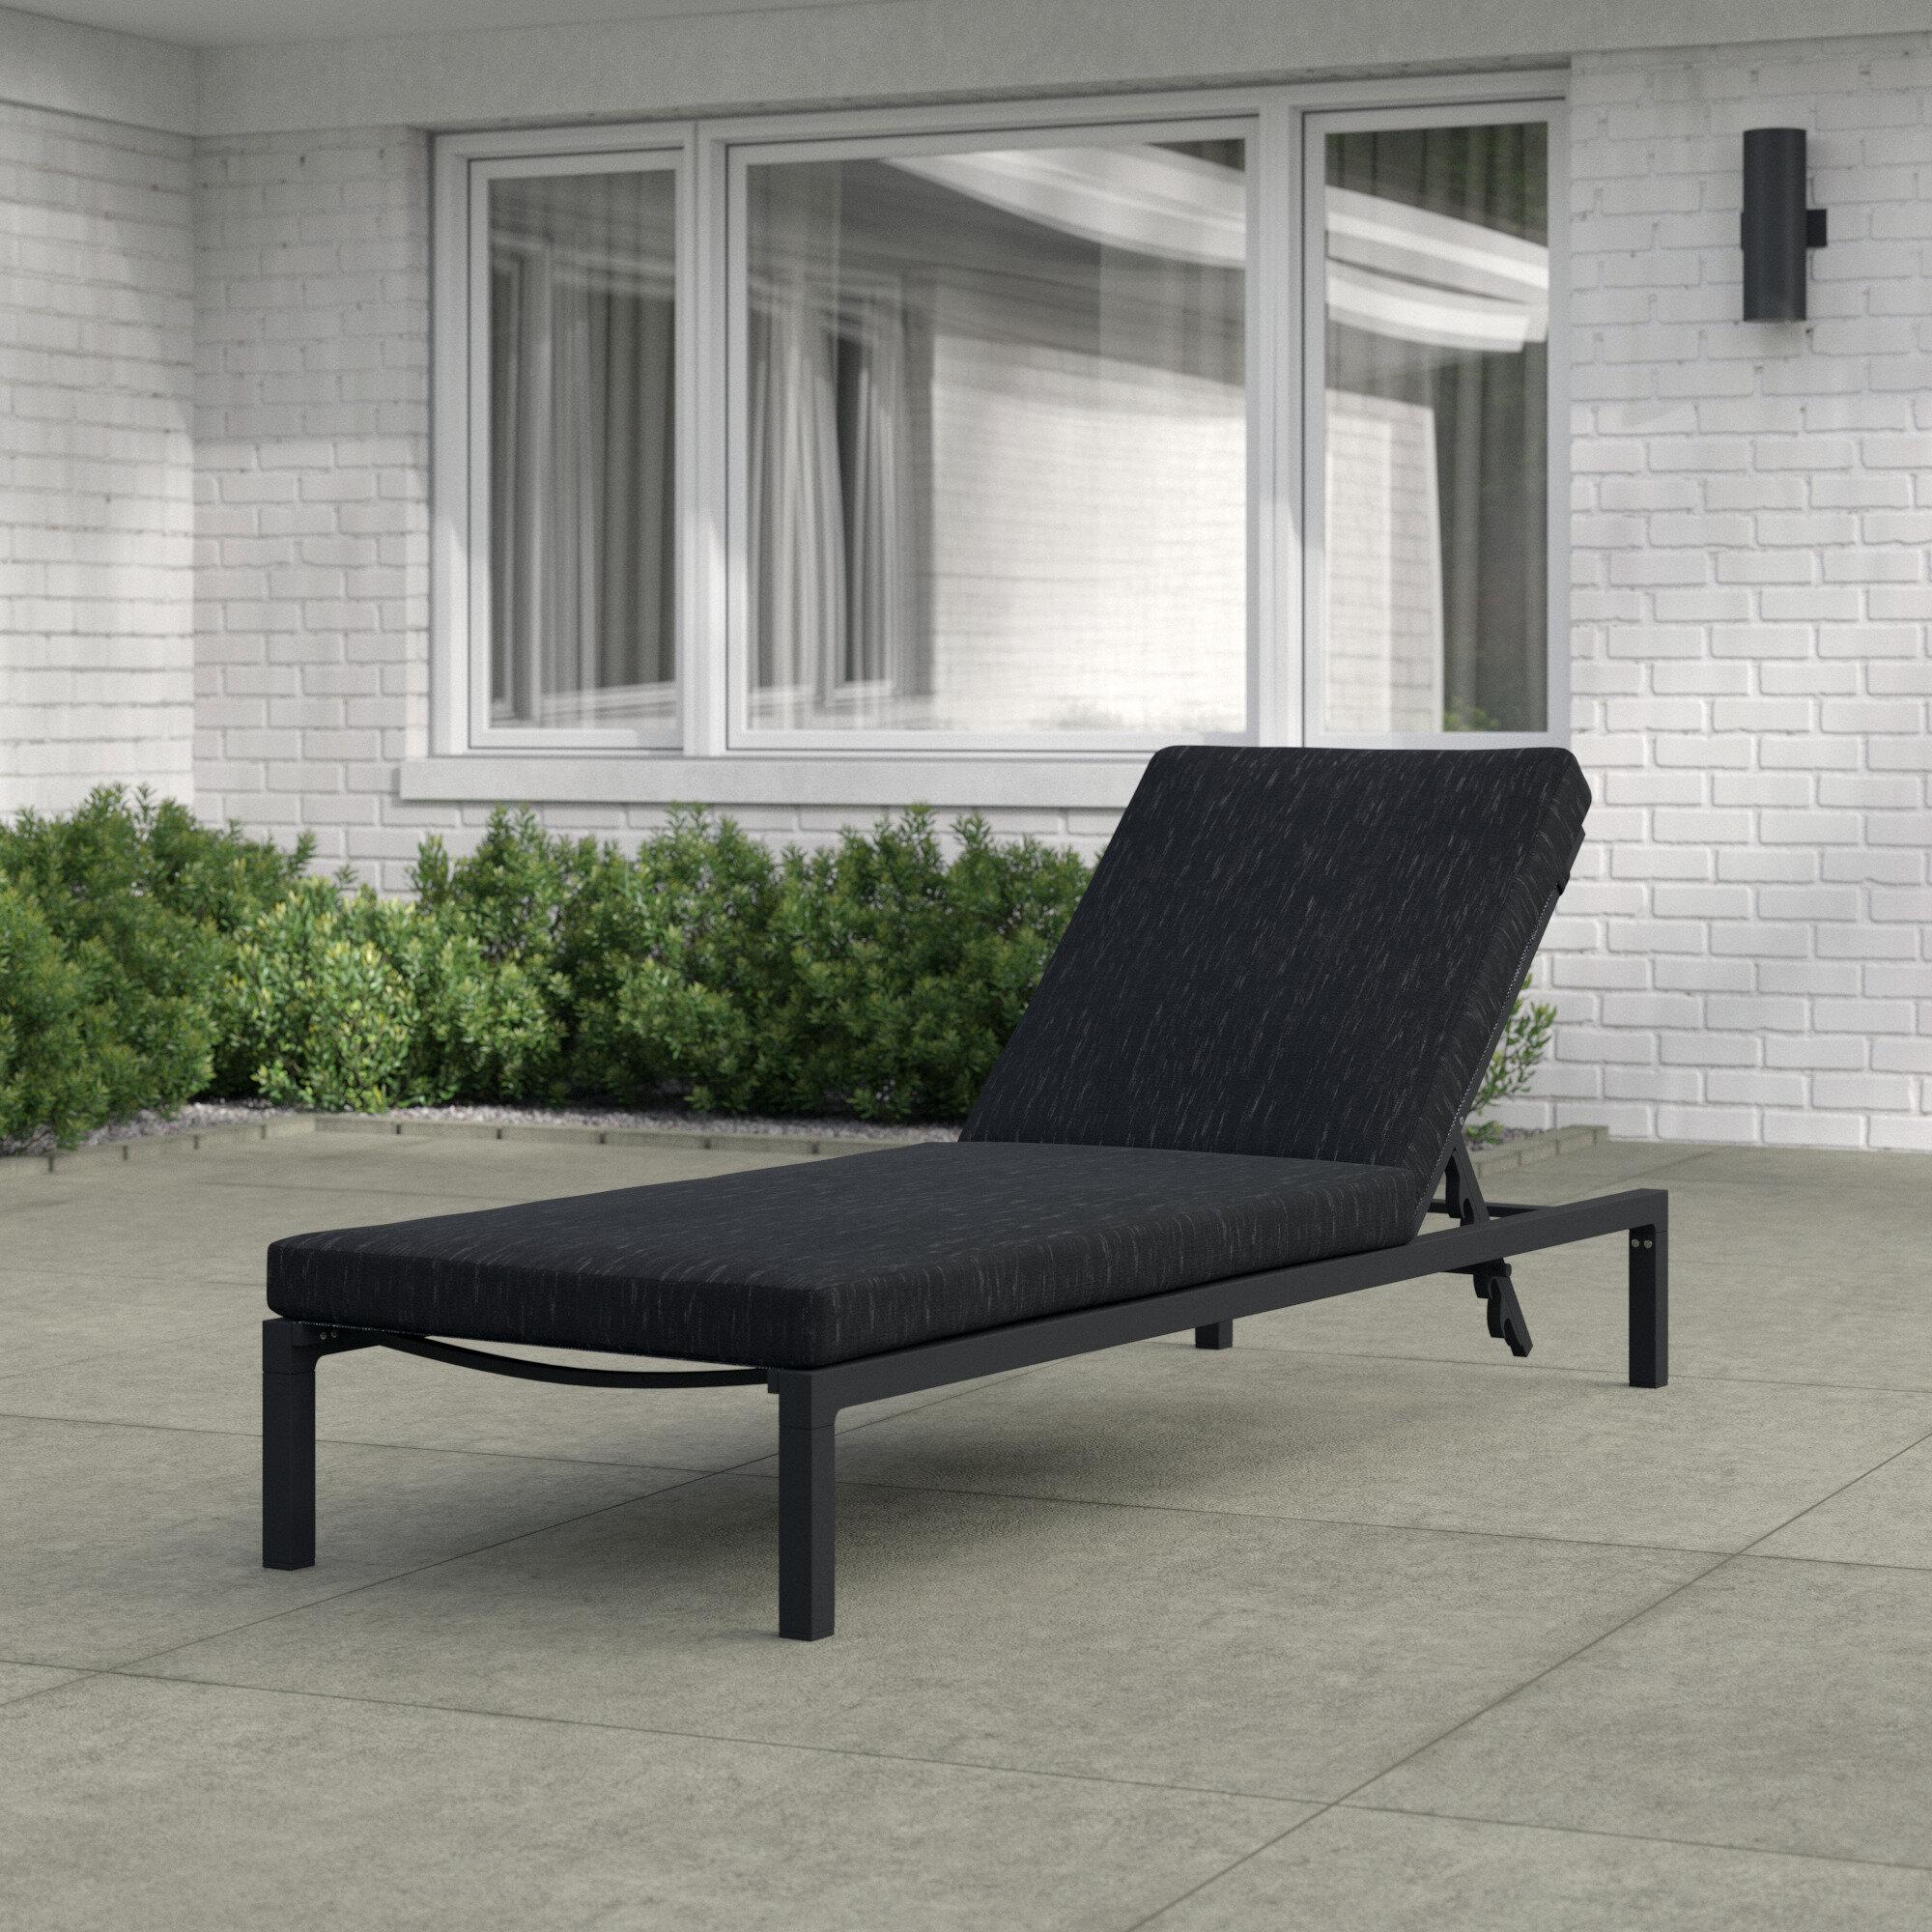 Mercury Row Mirando Reclining Chaise Lounge With Cushion Reviews Wayfair